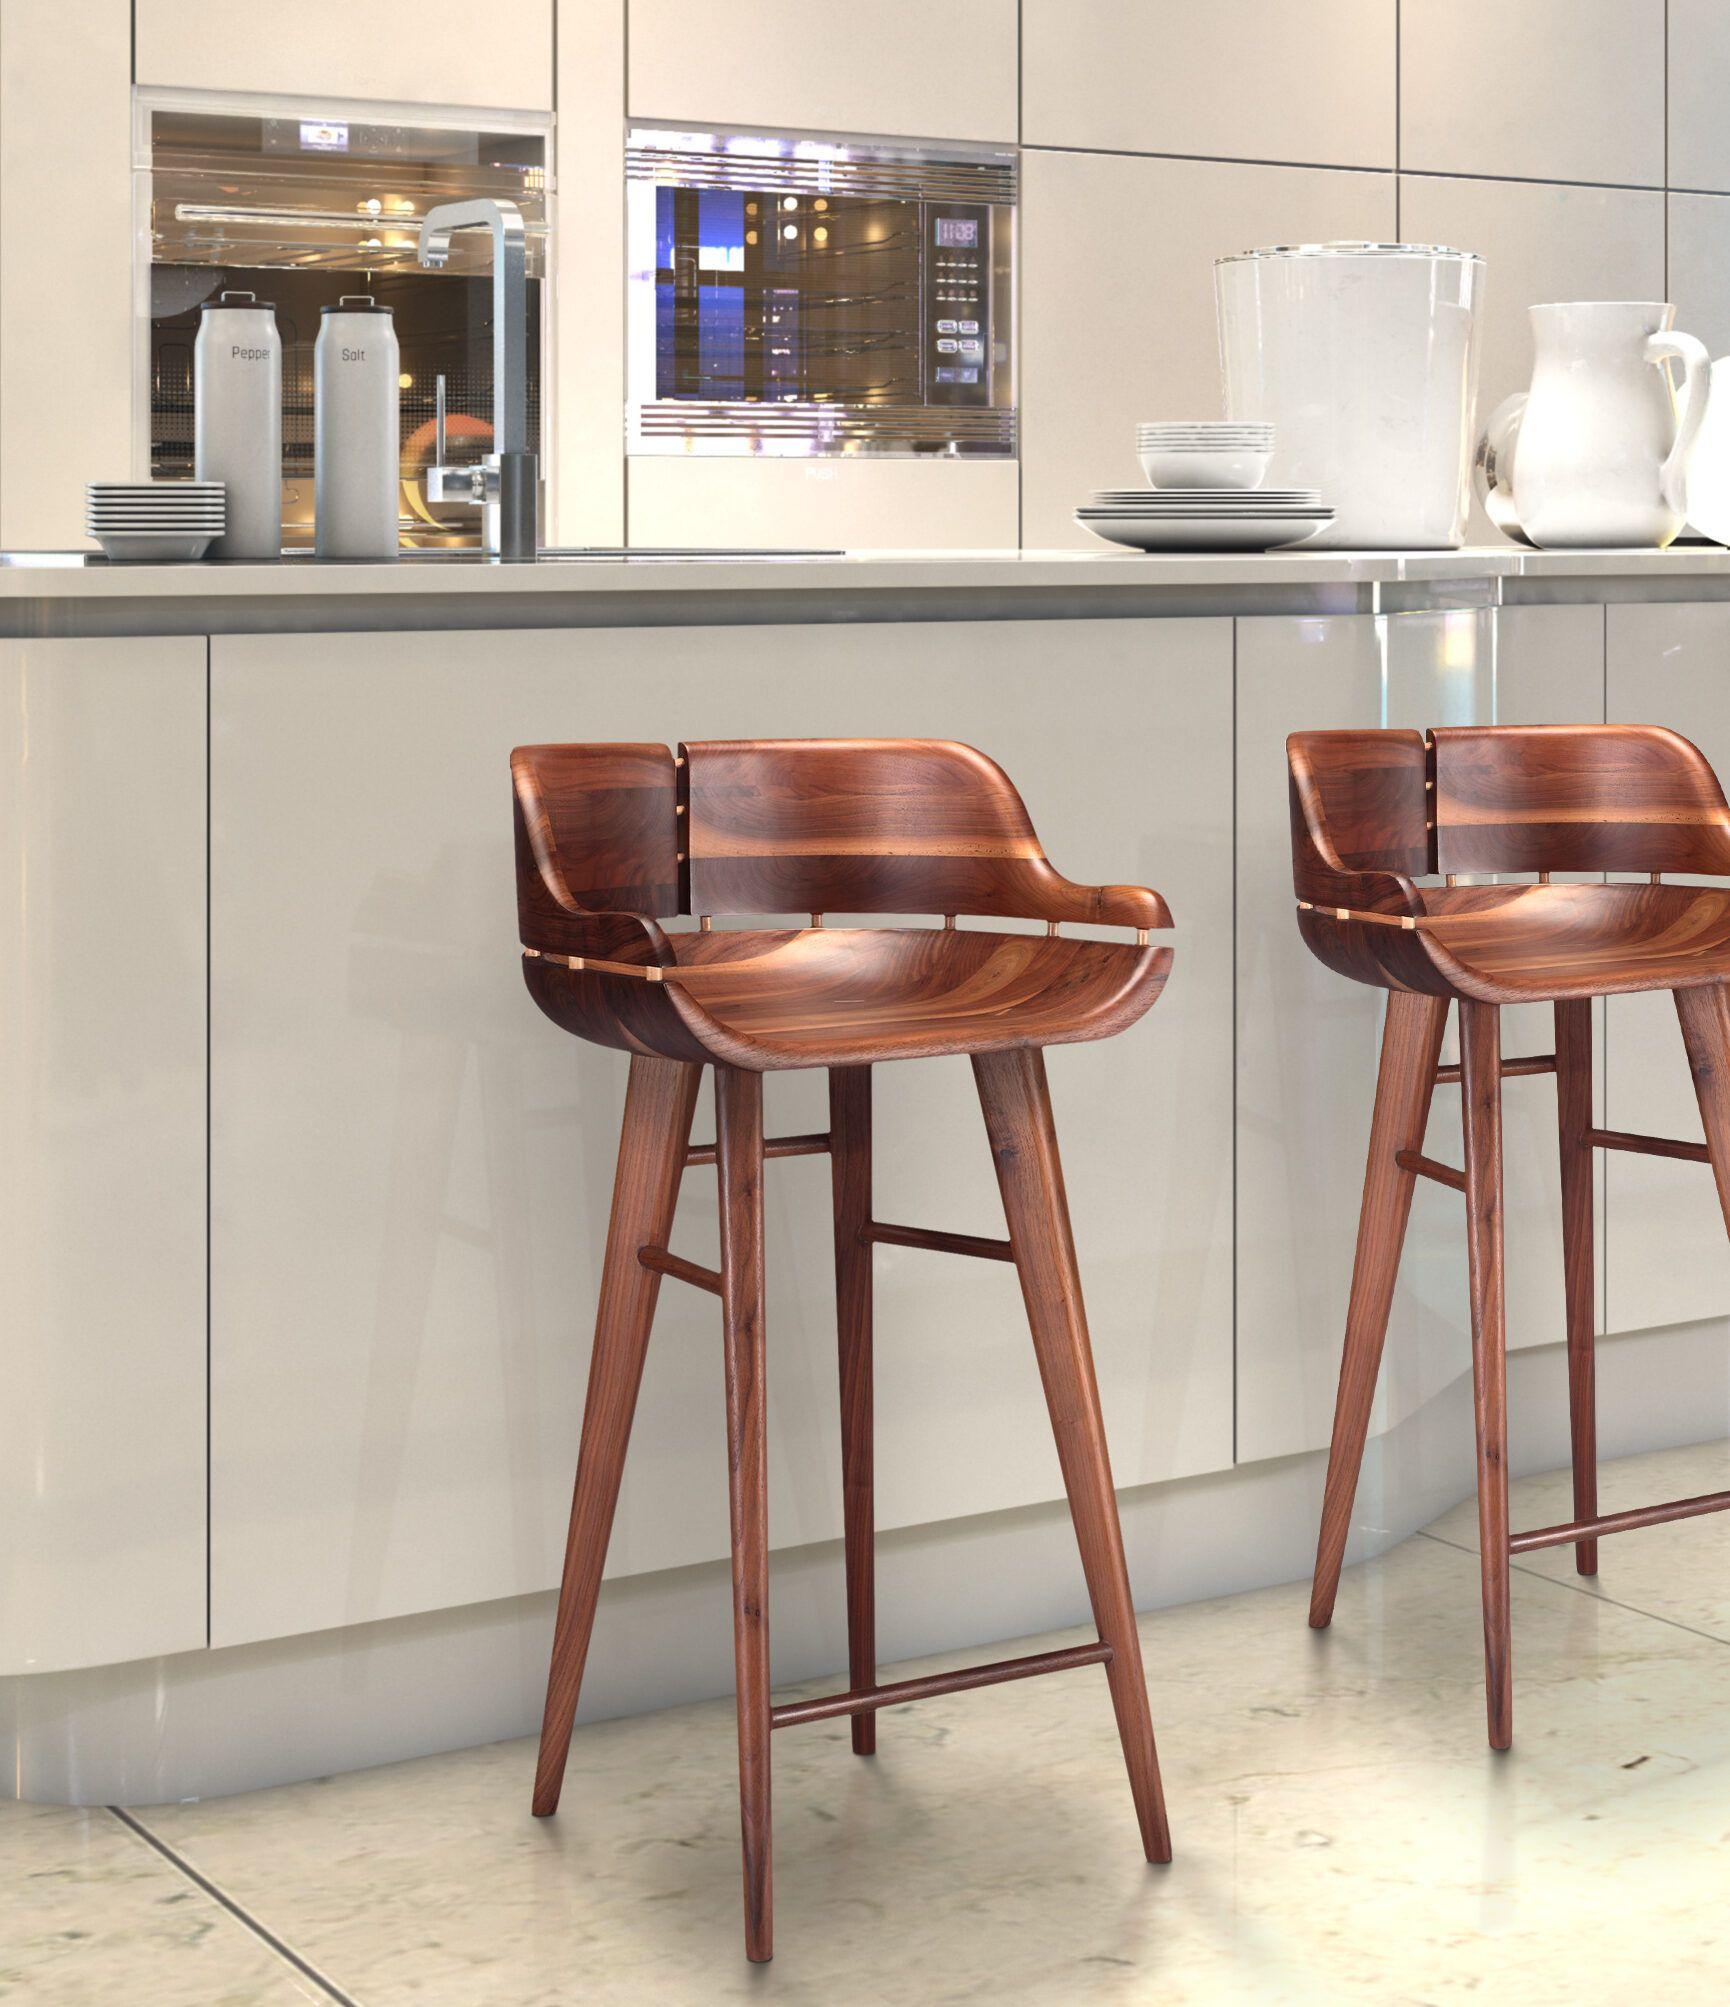 Kurf Walnut Stool Organic Modernism New York Walnut Stools Wood Bar Stools Bar Stools With Backs